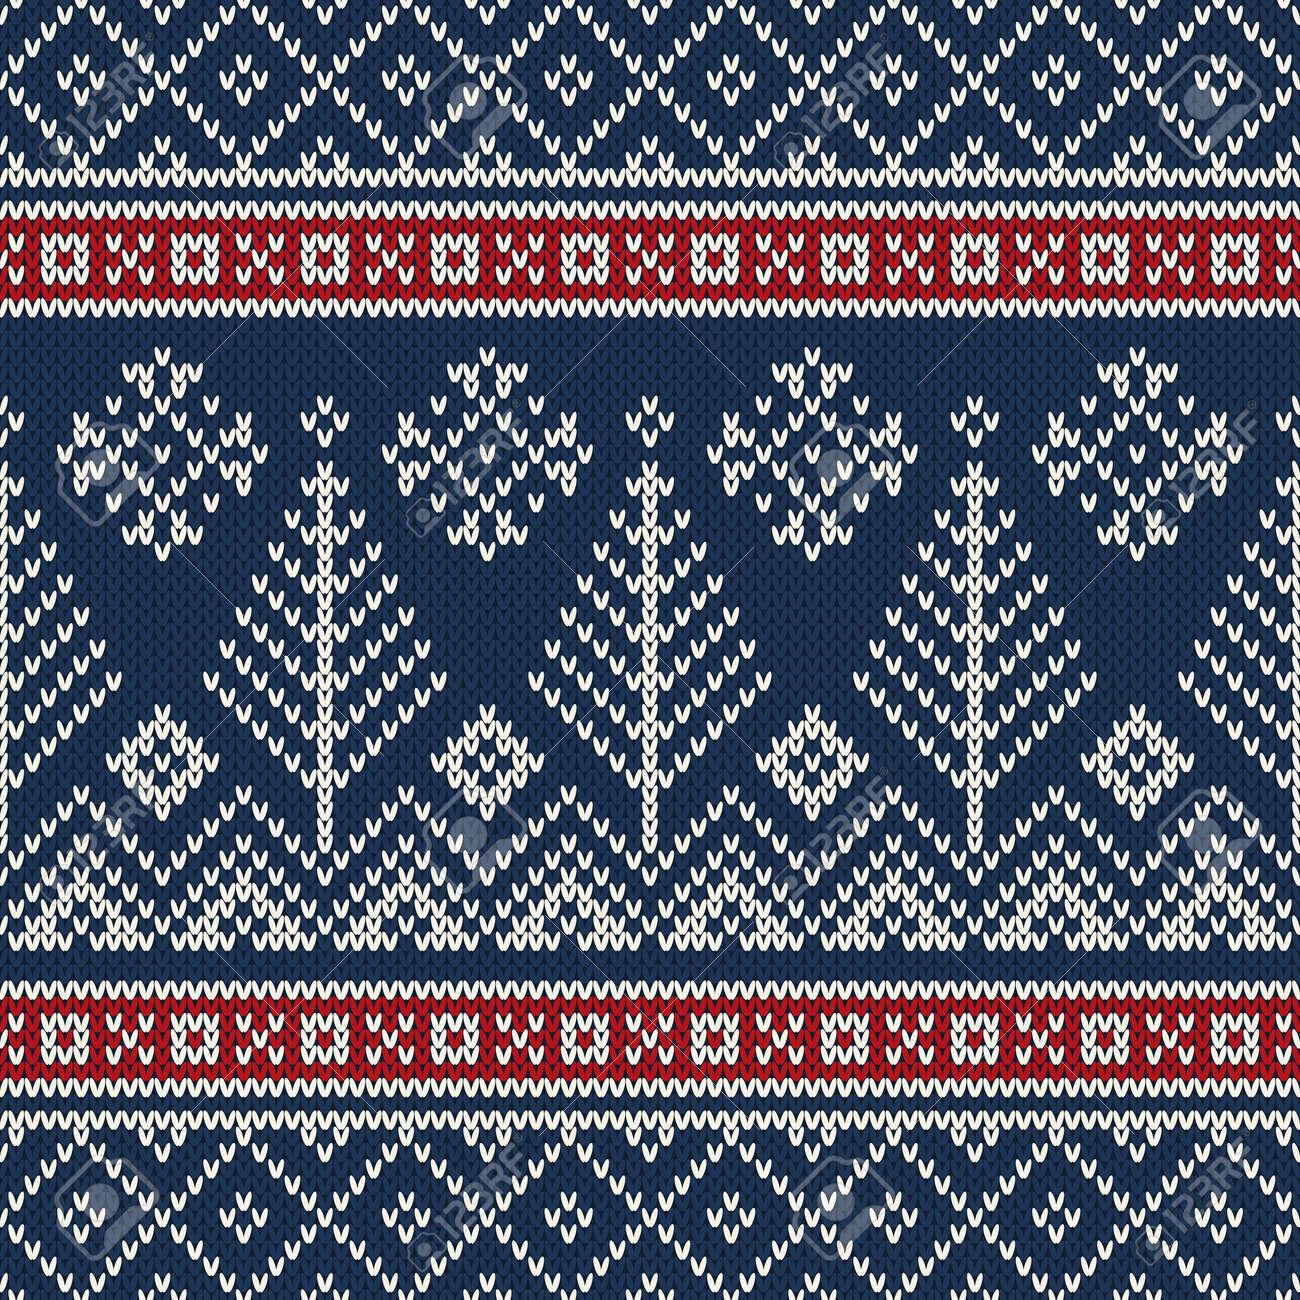 e11679961088 Christmas Sweater Design. Seamless Knitting Pattern Stock Vector - 45142554